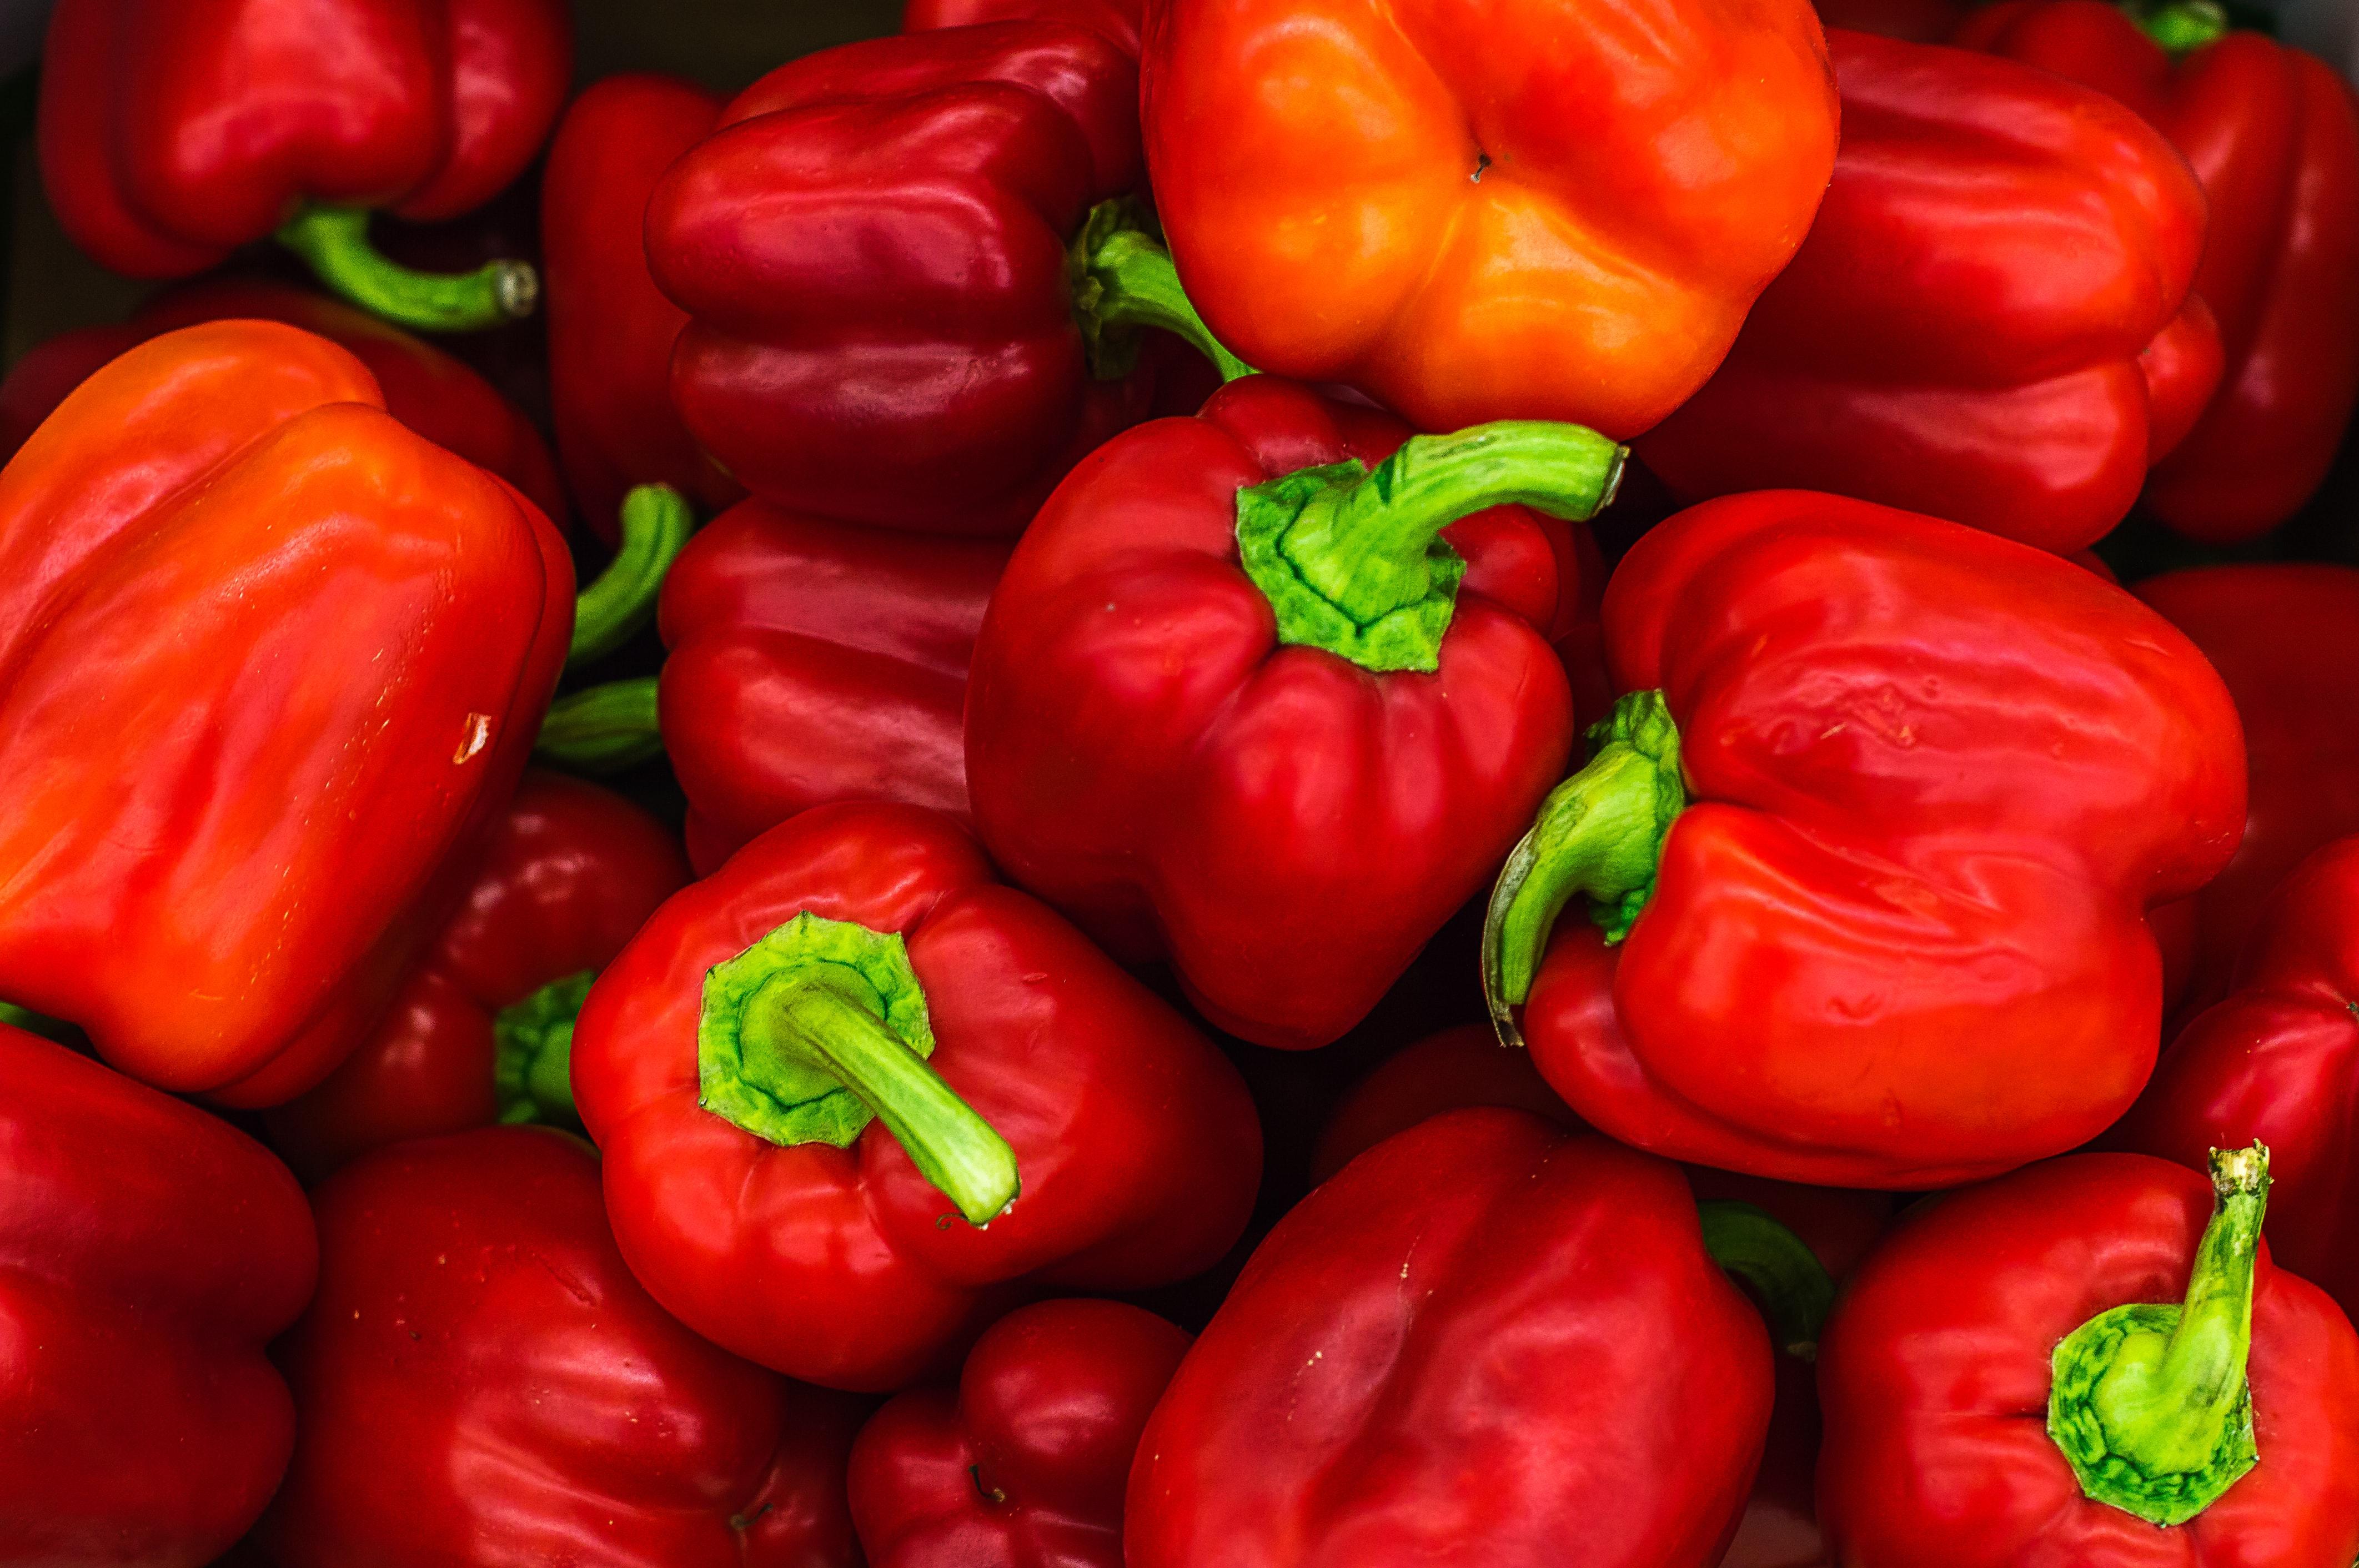 vitolda-klein-OVBiRdLWFJM-unsplash red peppers